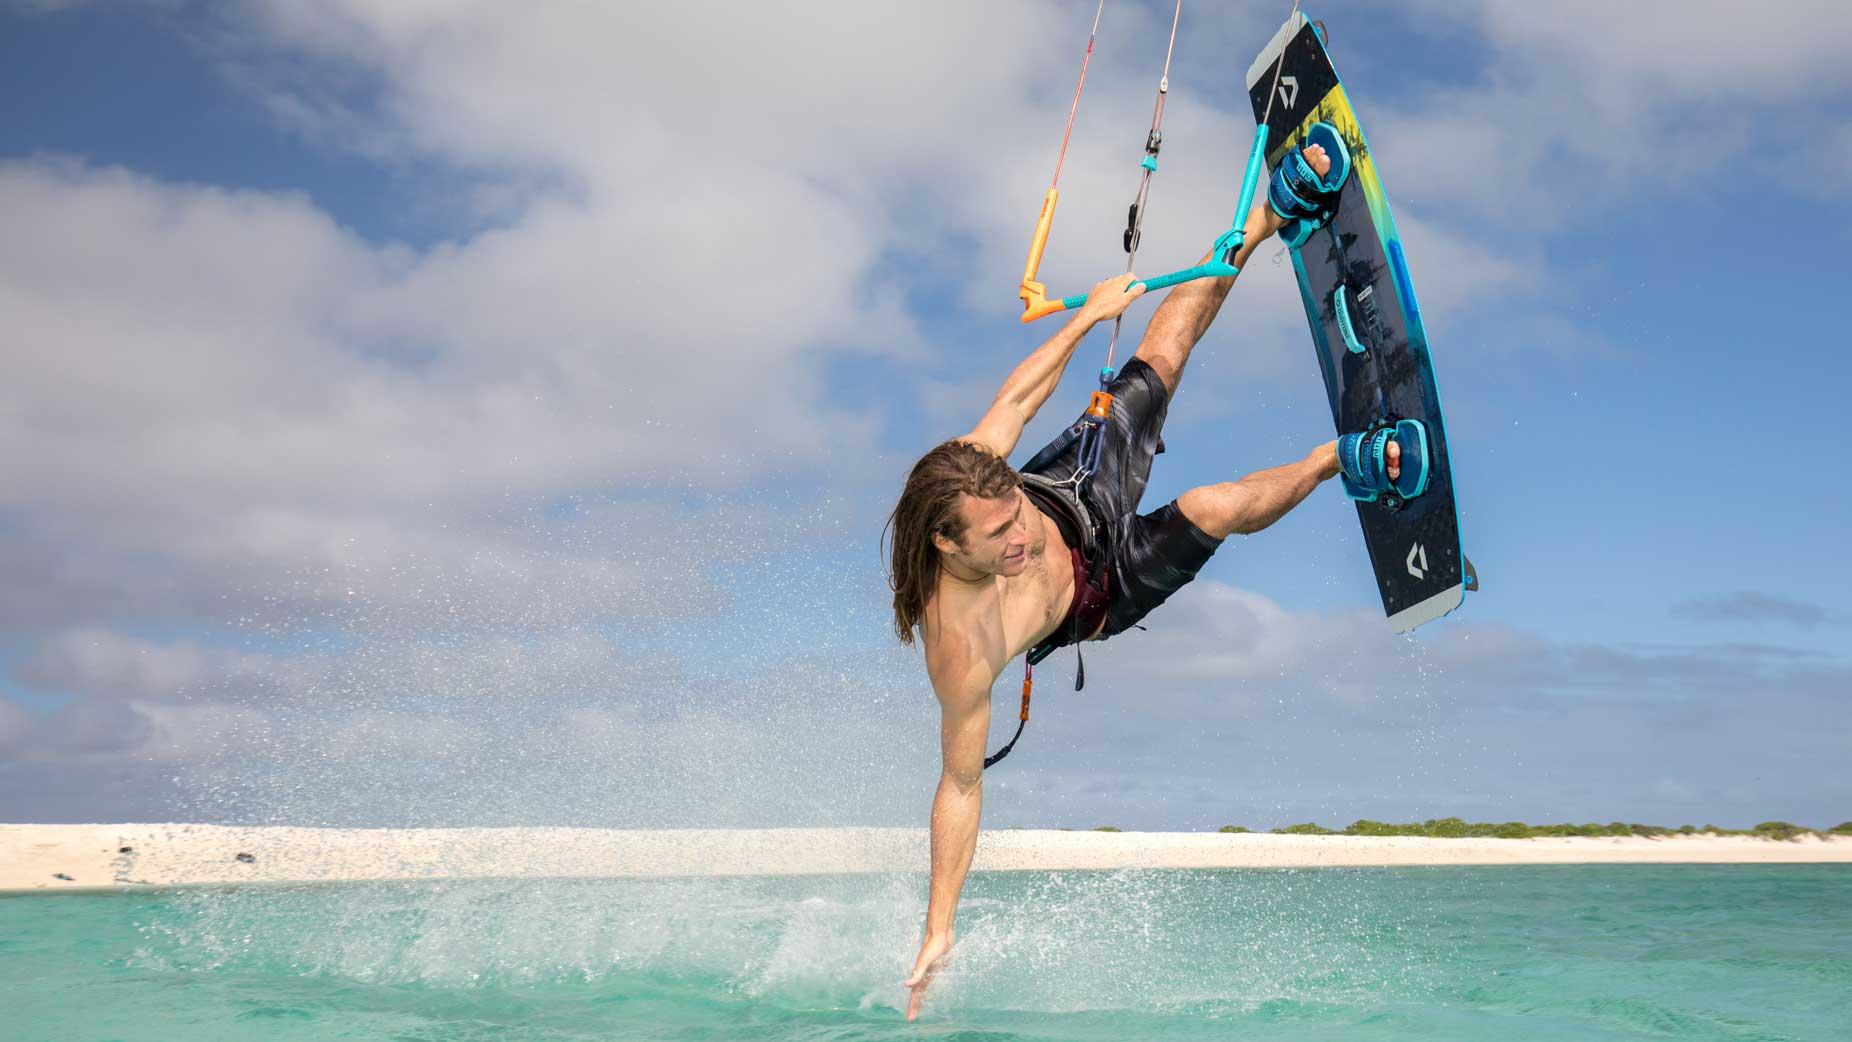 QUICK RELEASE FREESTYLE KIT Bars DUOTONE TRUST BAR QUAD CONTROL 24 METER KITE BAR Kitesurfen